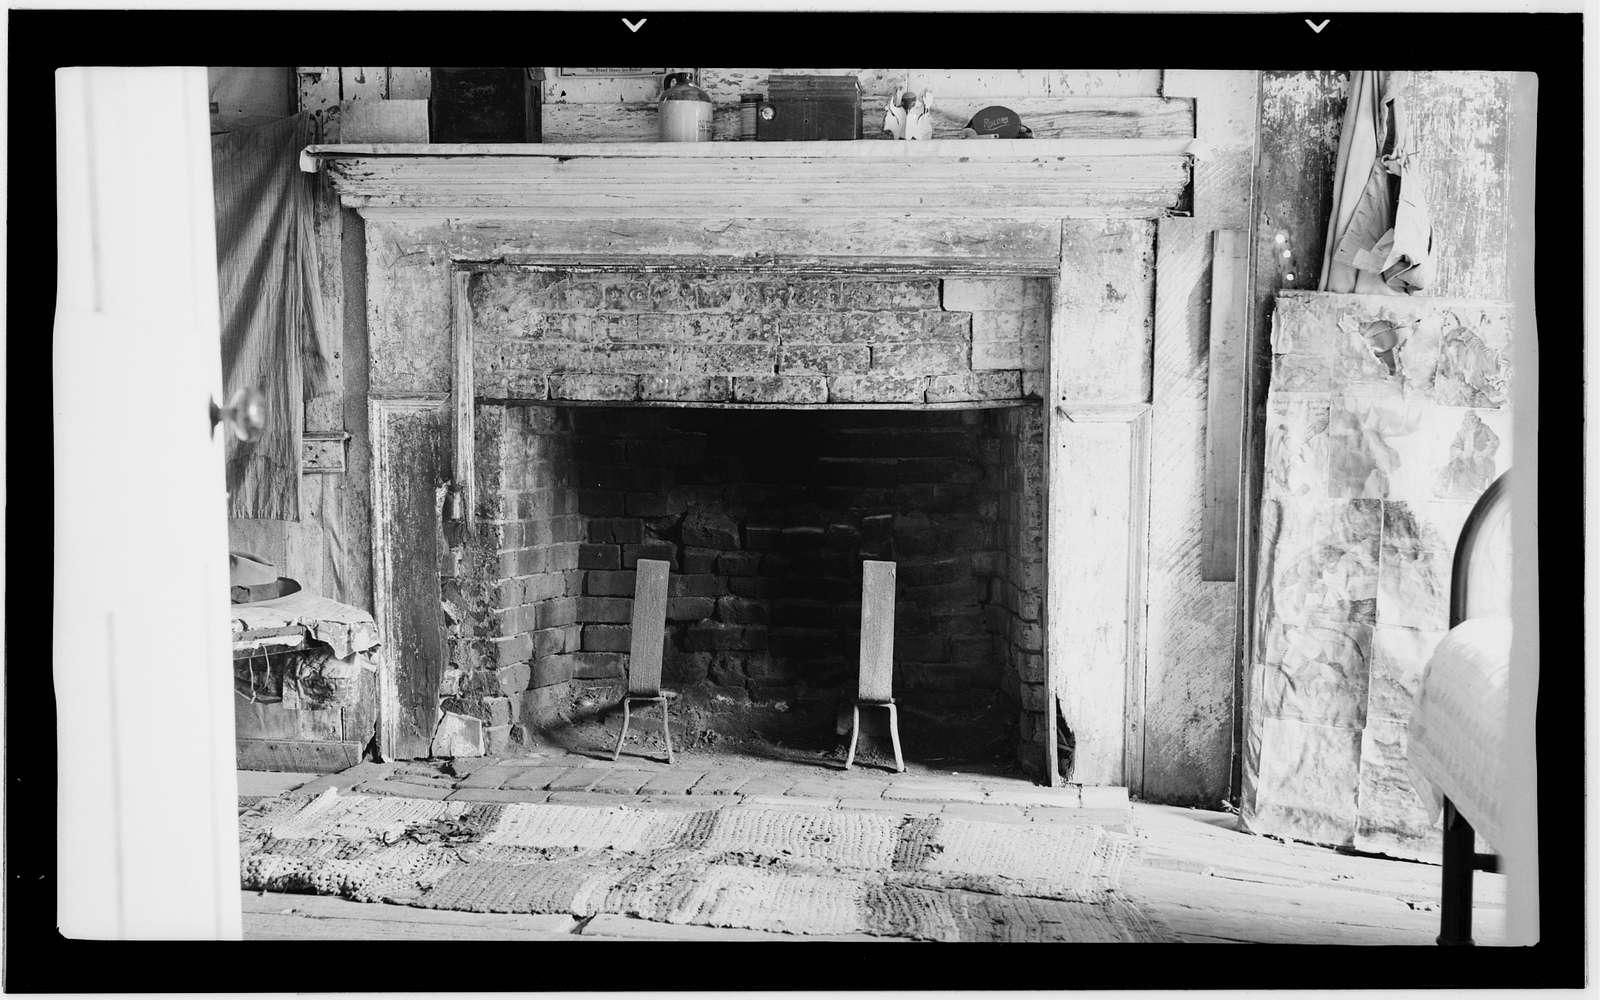 Mound Plantation, Route 4, Box 166, Cannonsburg, Jefferson County, MS